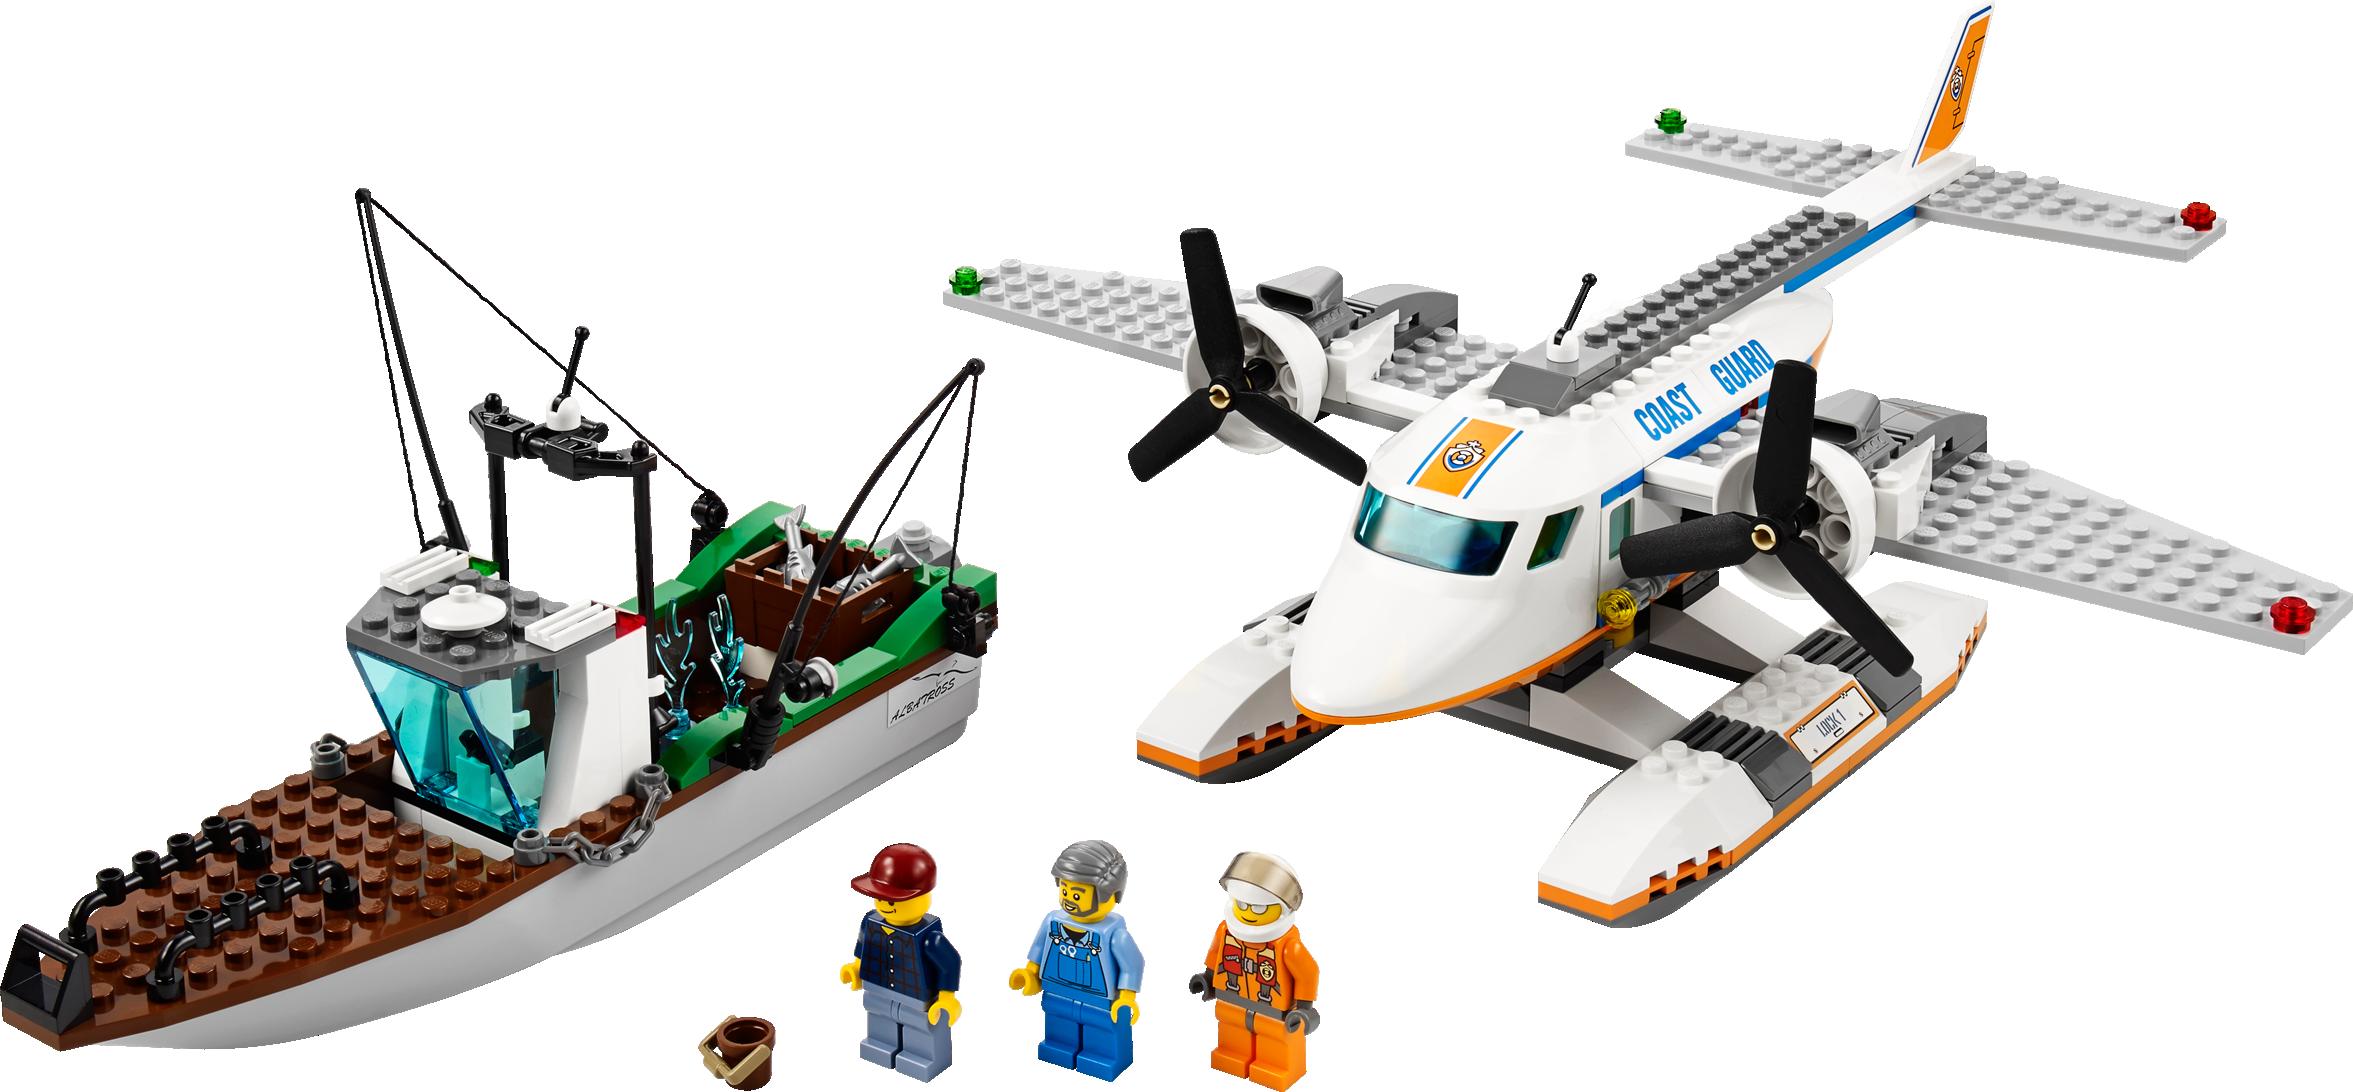 Coast Guard Plane